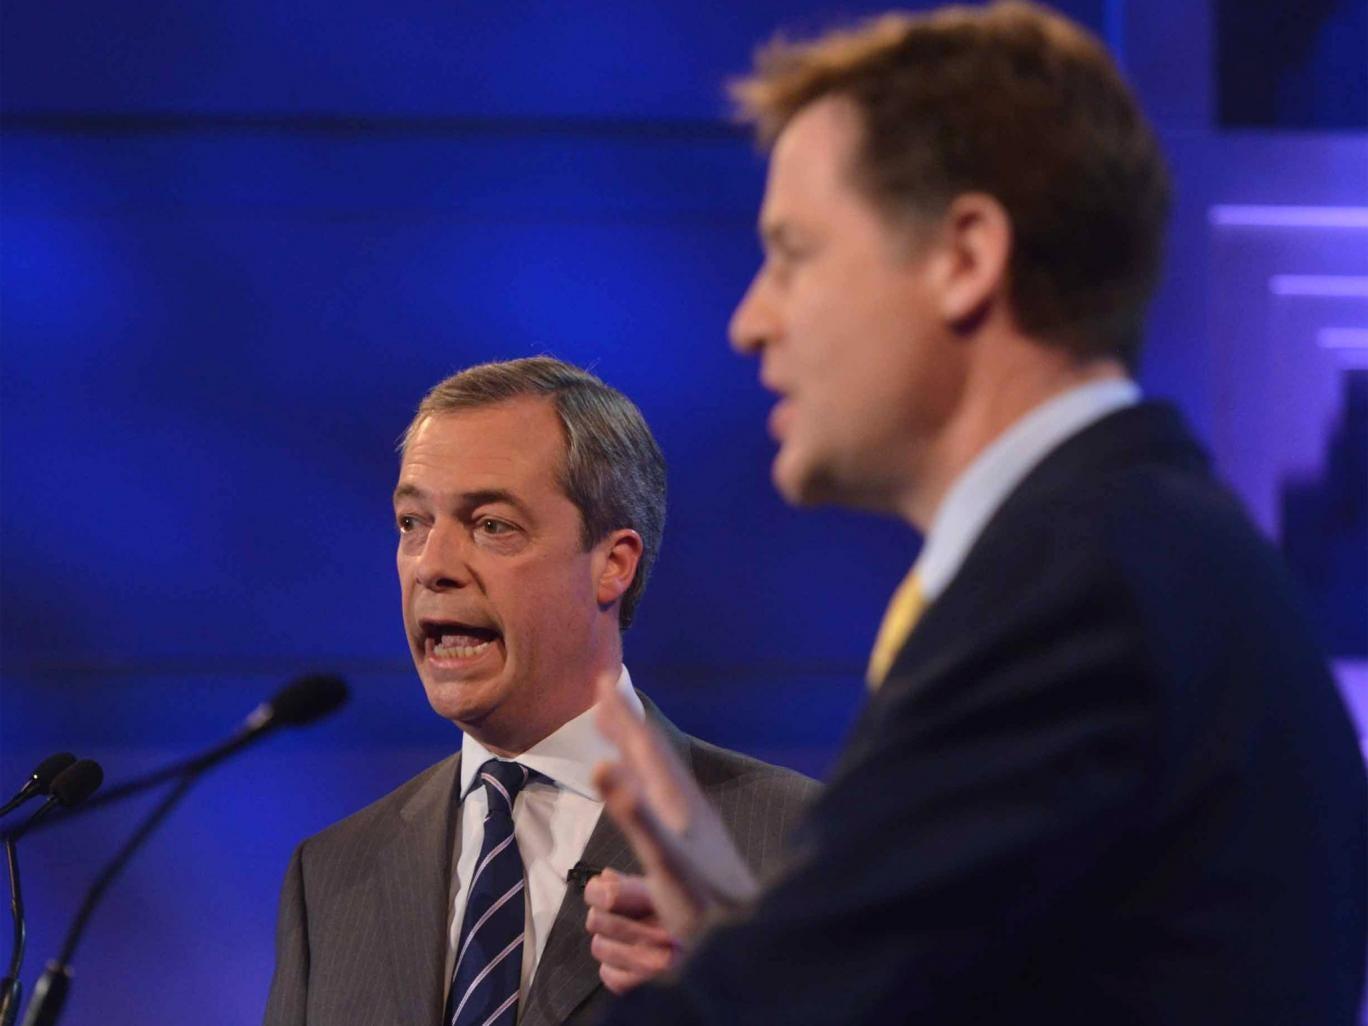 Deputy Prime Minister Nick Clegg and Ukip leader Nigel Farage during their second televised debate